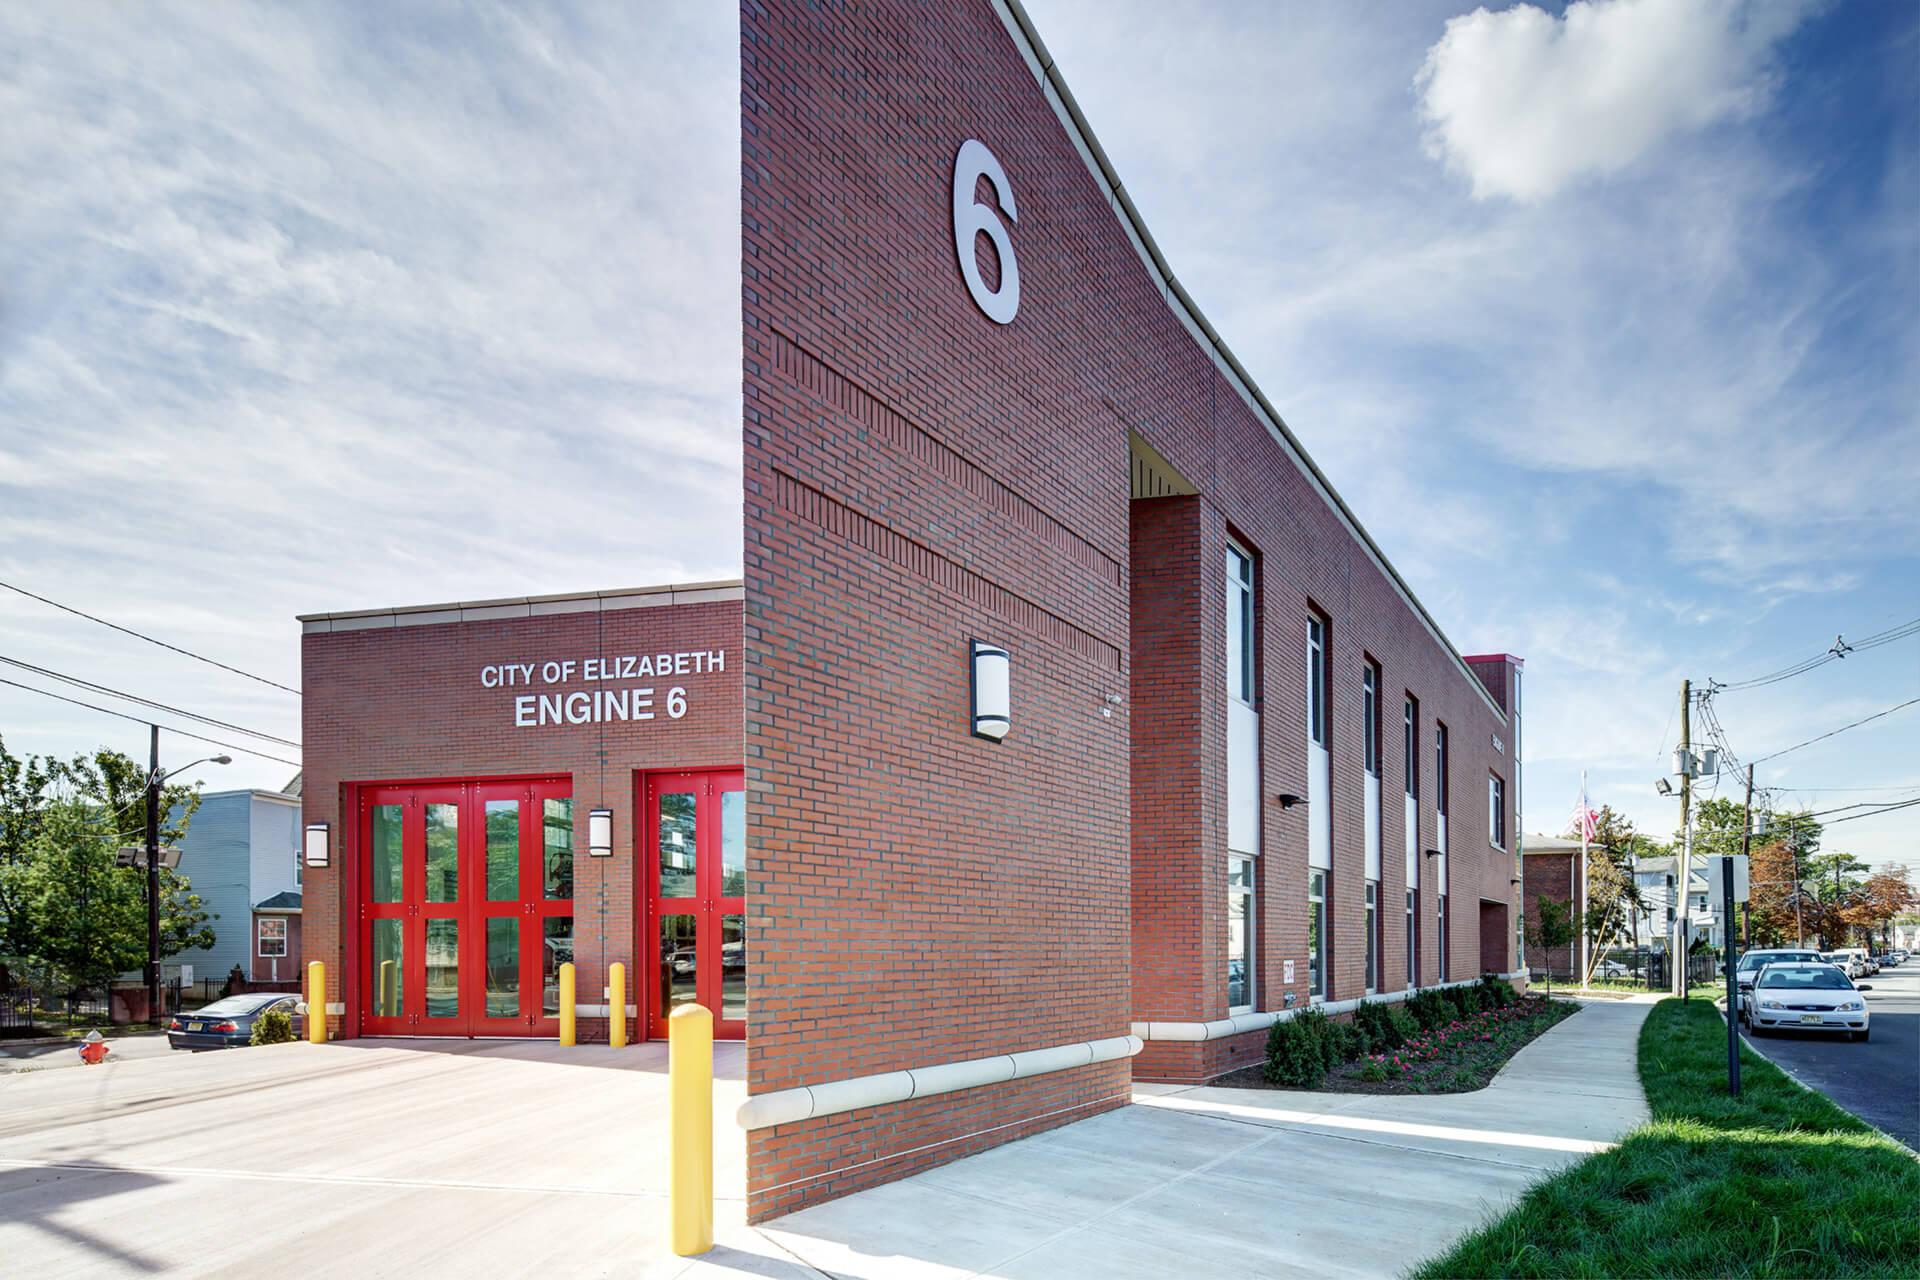 Elizabeth Fire House 6 Exterior